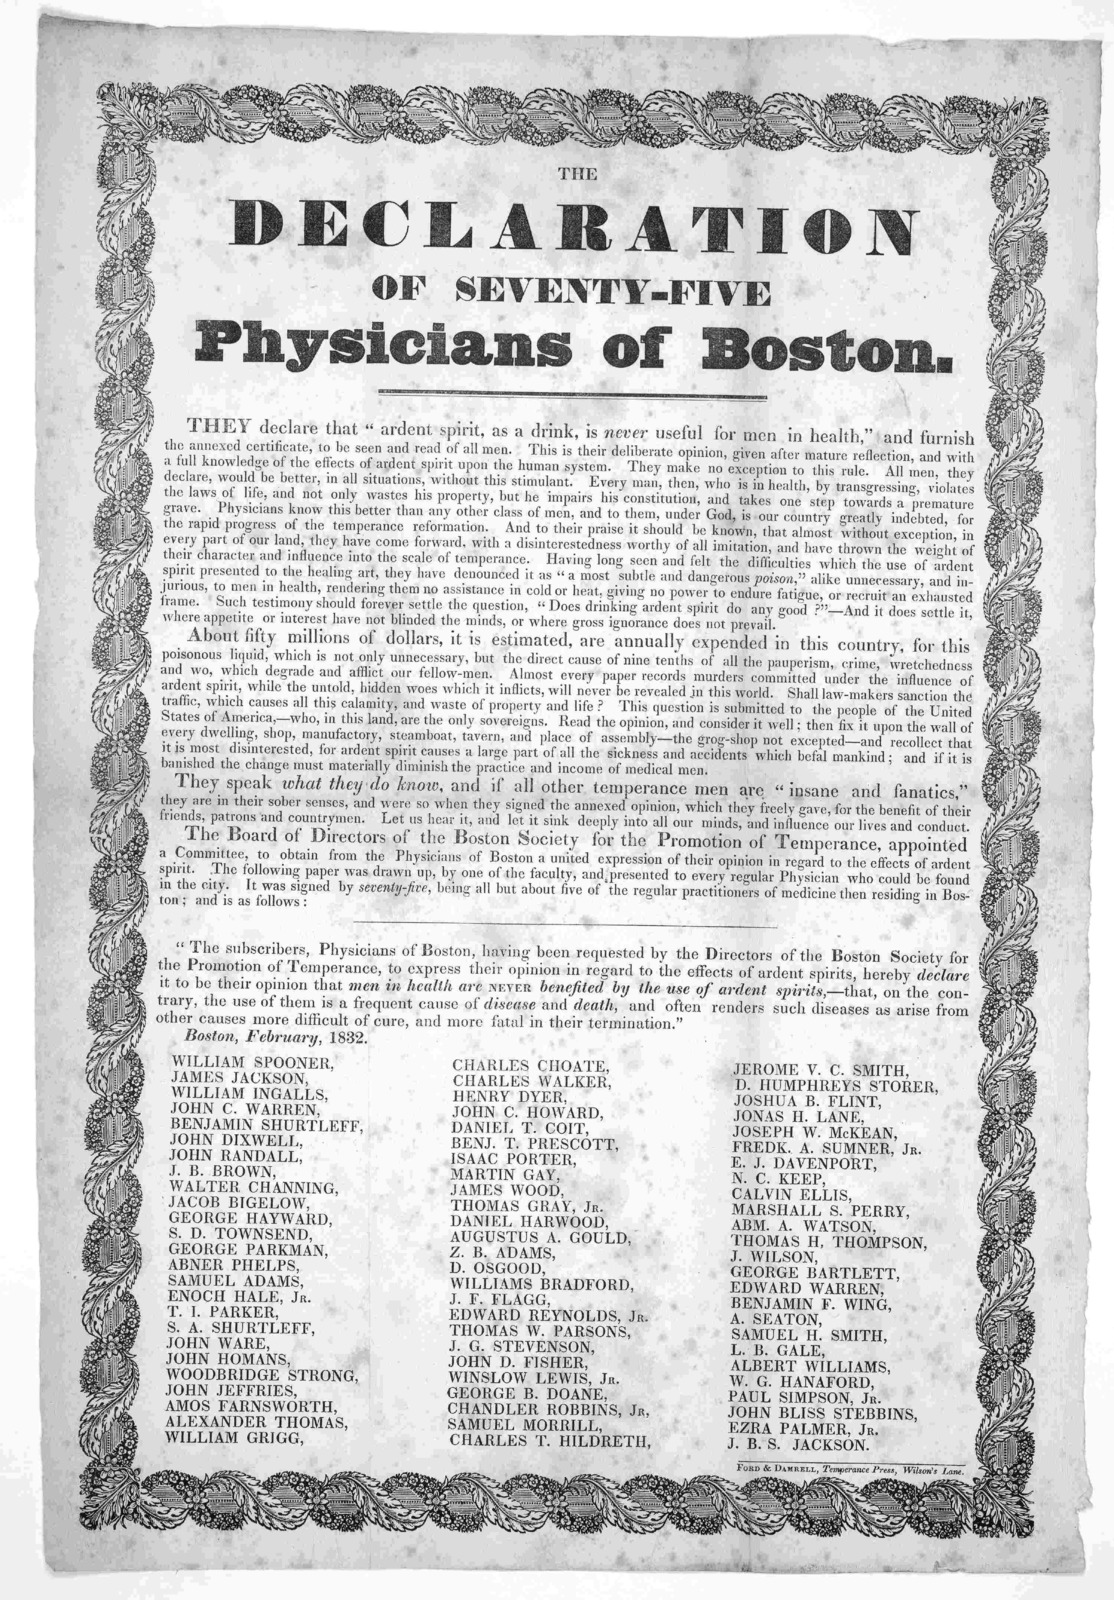 The declaration of seventy-five physicians of Boston ... Ford & Damrell, Temperance Press, Wilson's Lane Boston 1832.